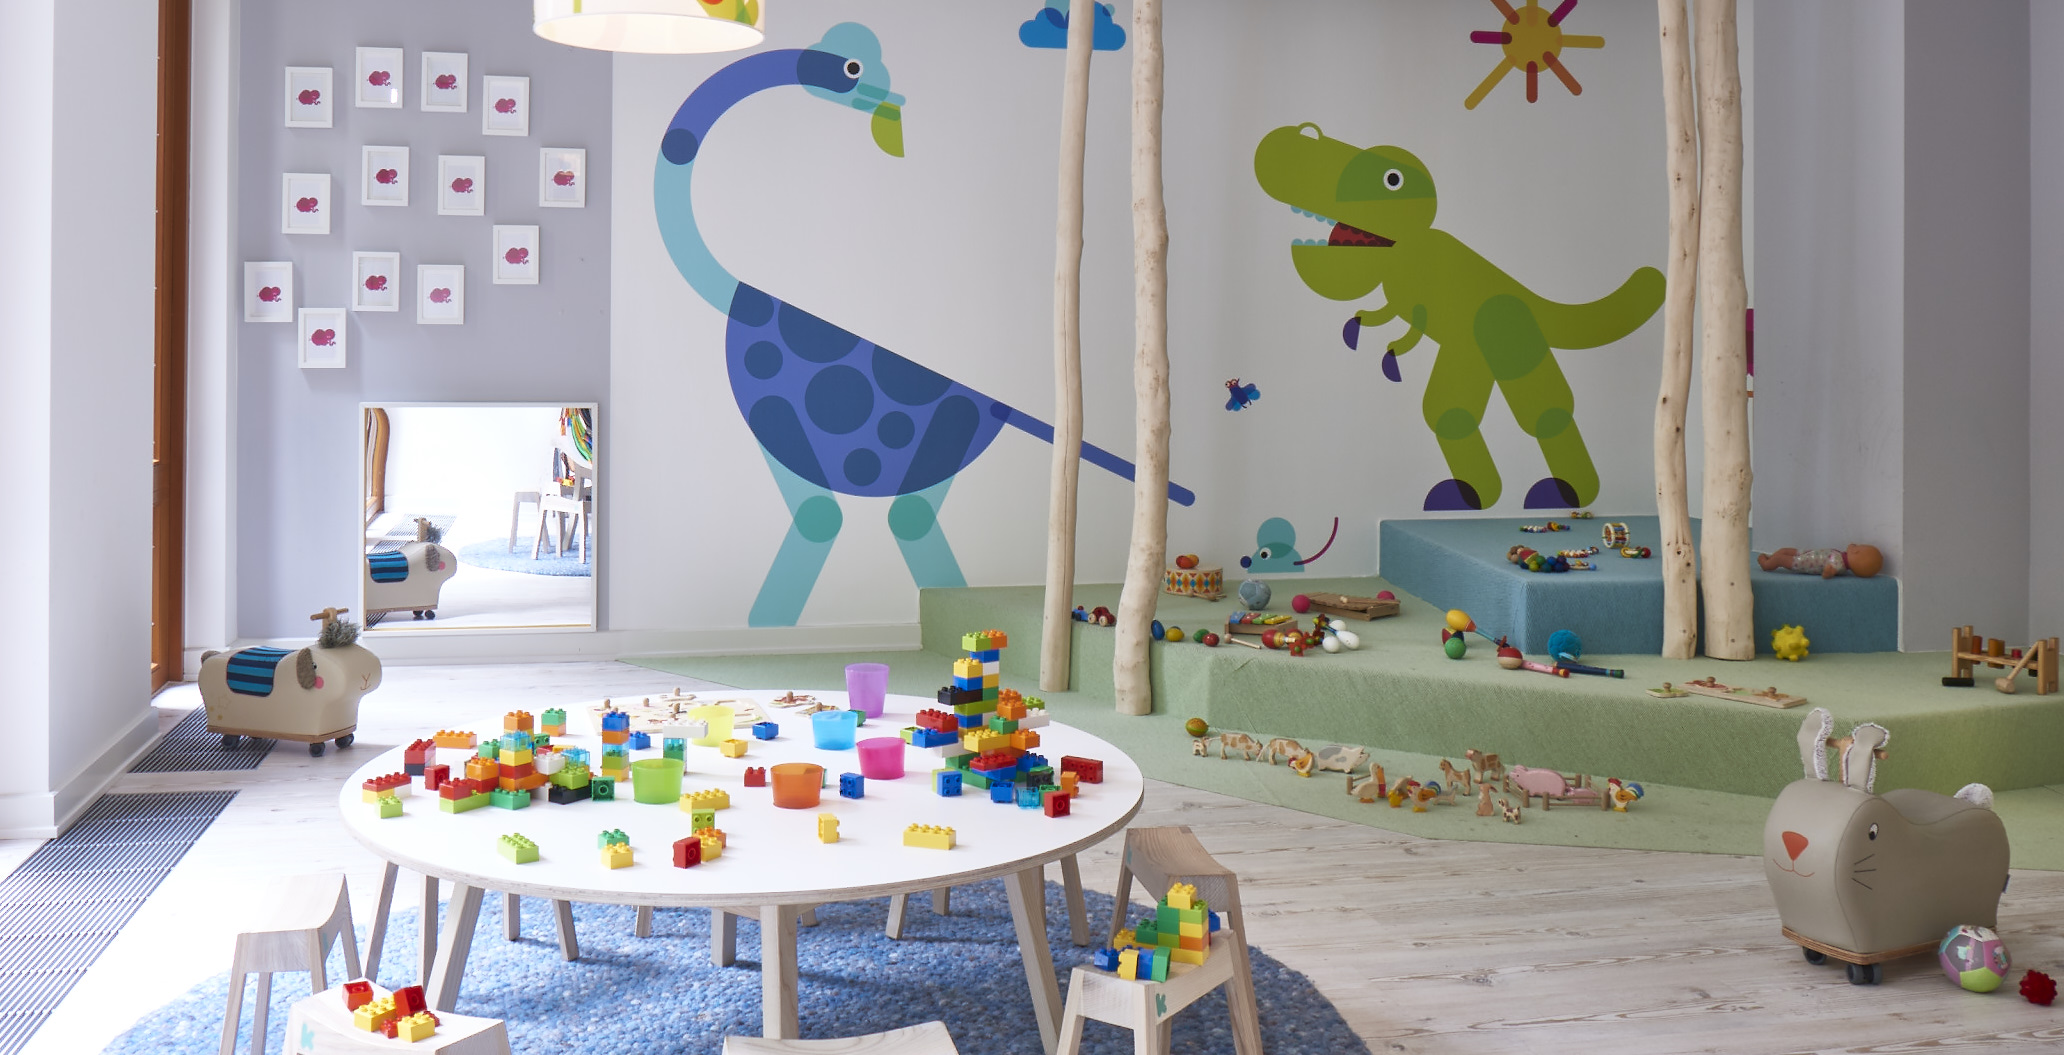 KiTa Kinderzimmer Conventparc Private Kindergärten